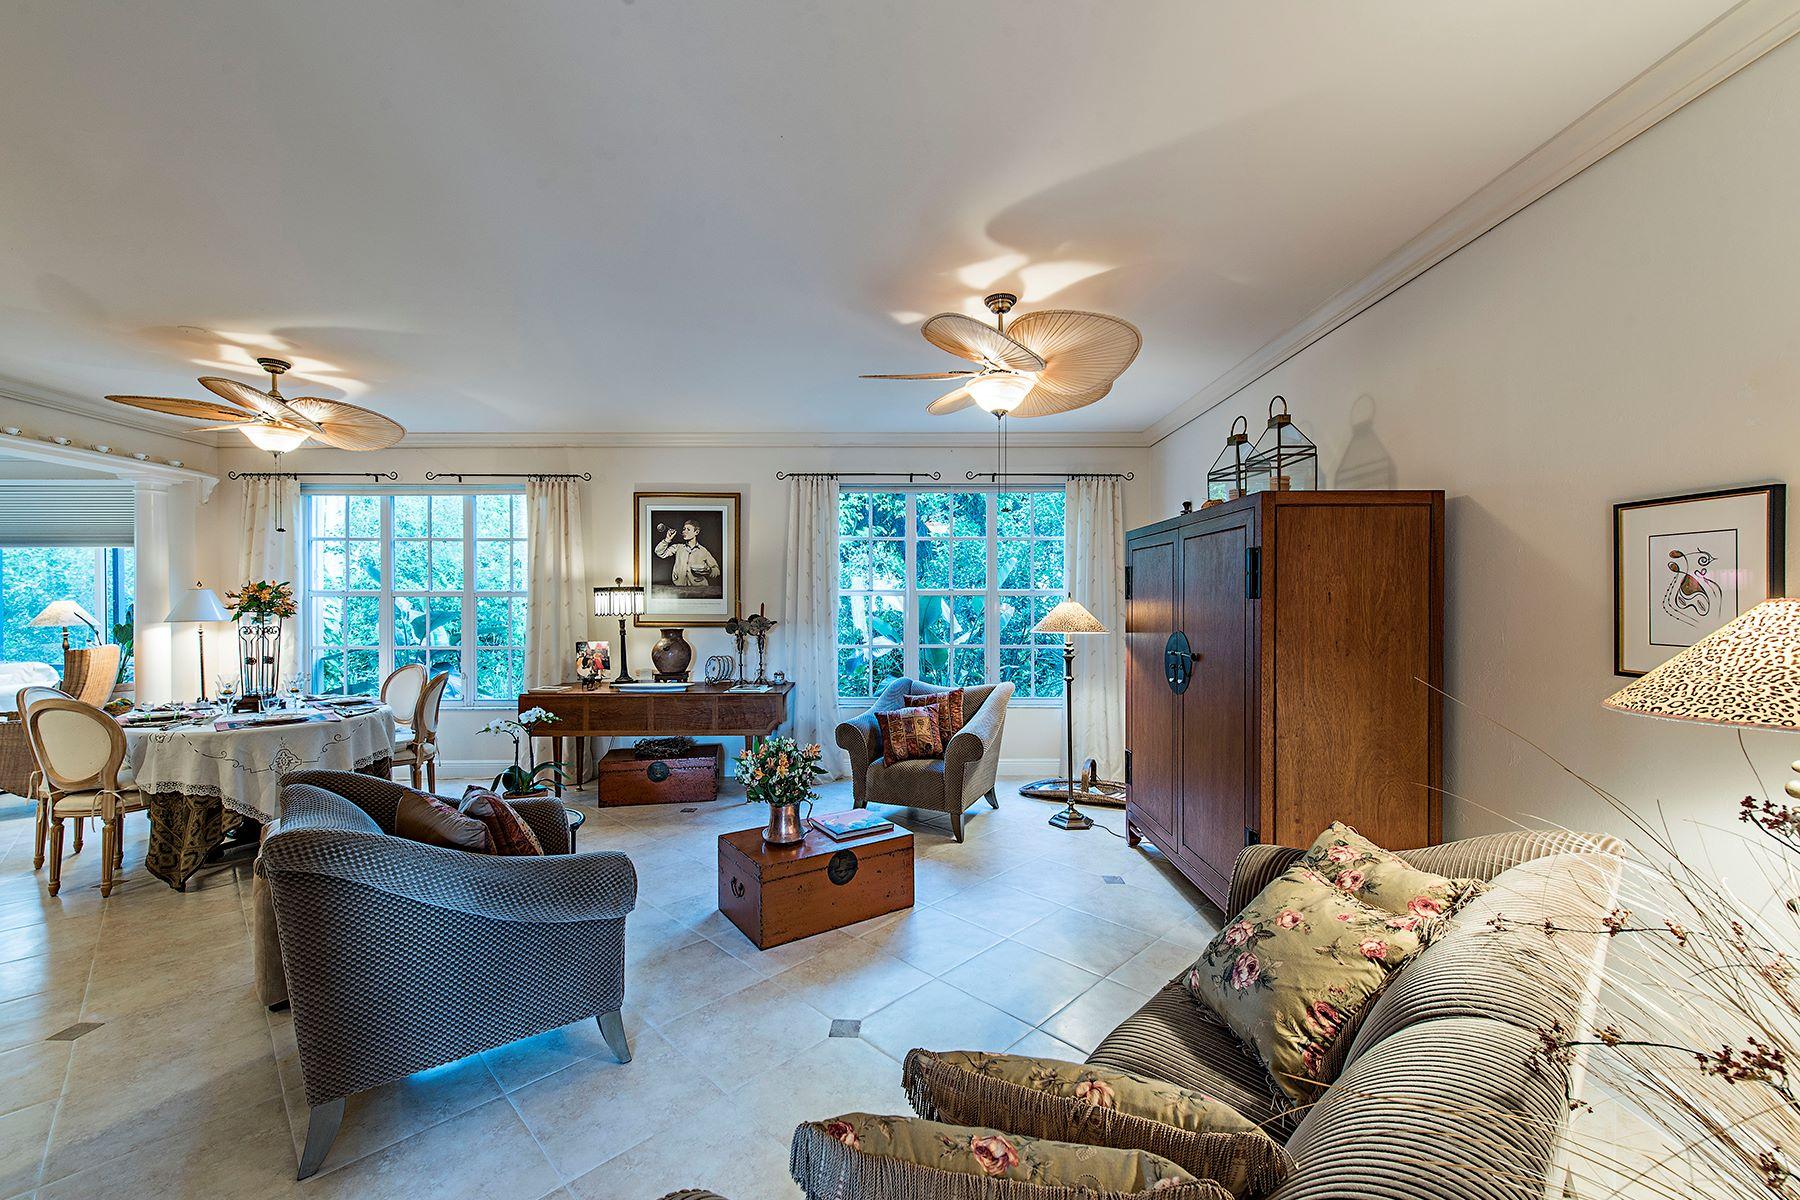 Condominium for Sale at PELICAN BAY - SAN MARINO 6865 San Marino Dr 305C, Naples, Florida 34108 United States